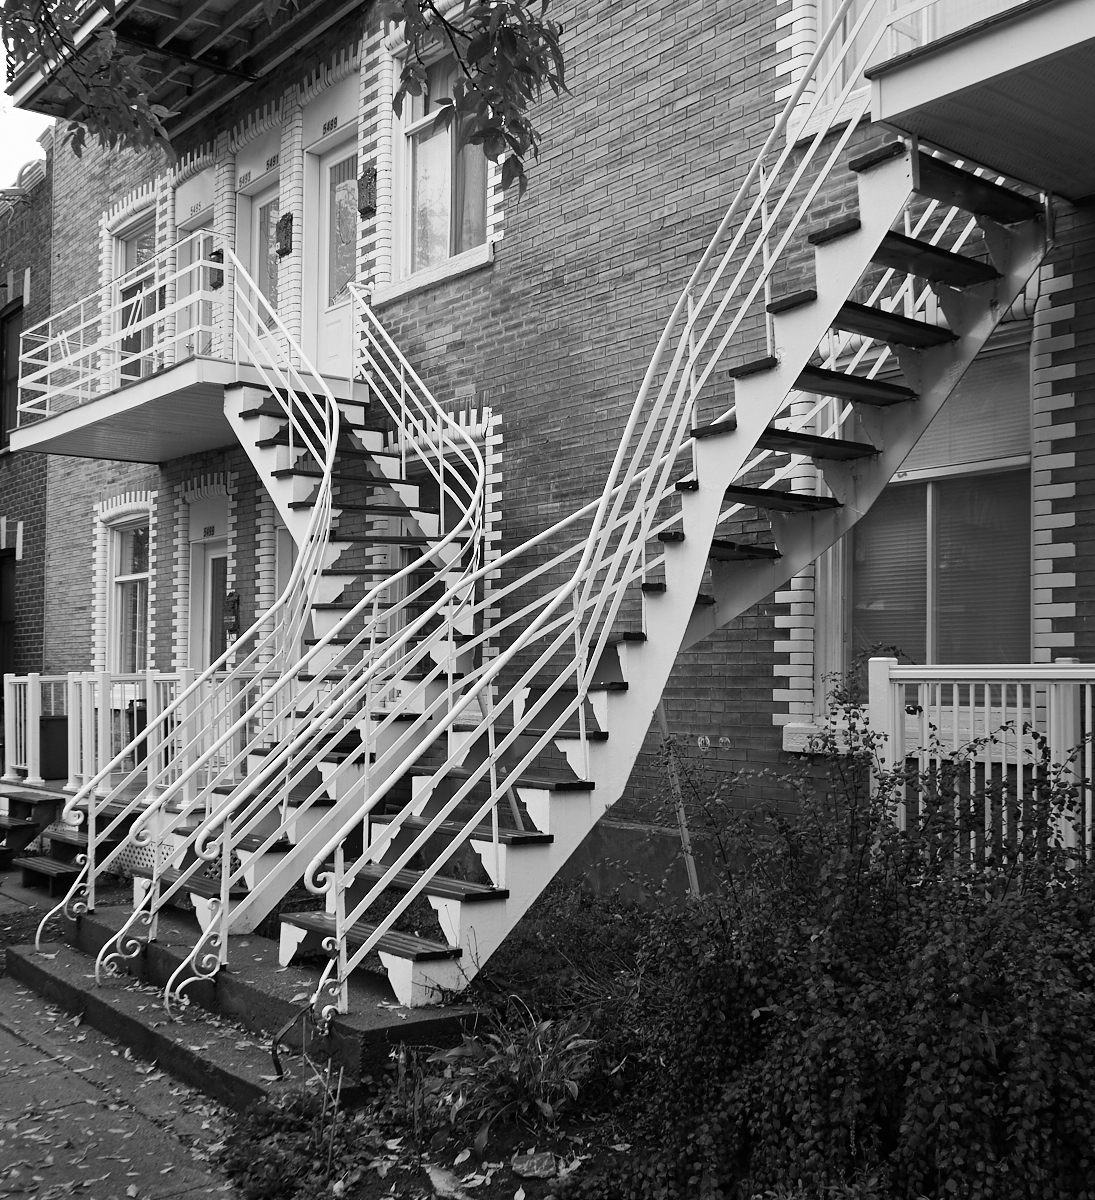 Montreal ironwork1600x1200 sRGB 6.jpg